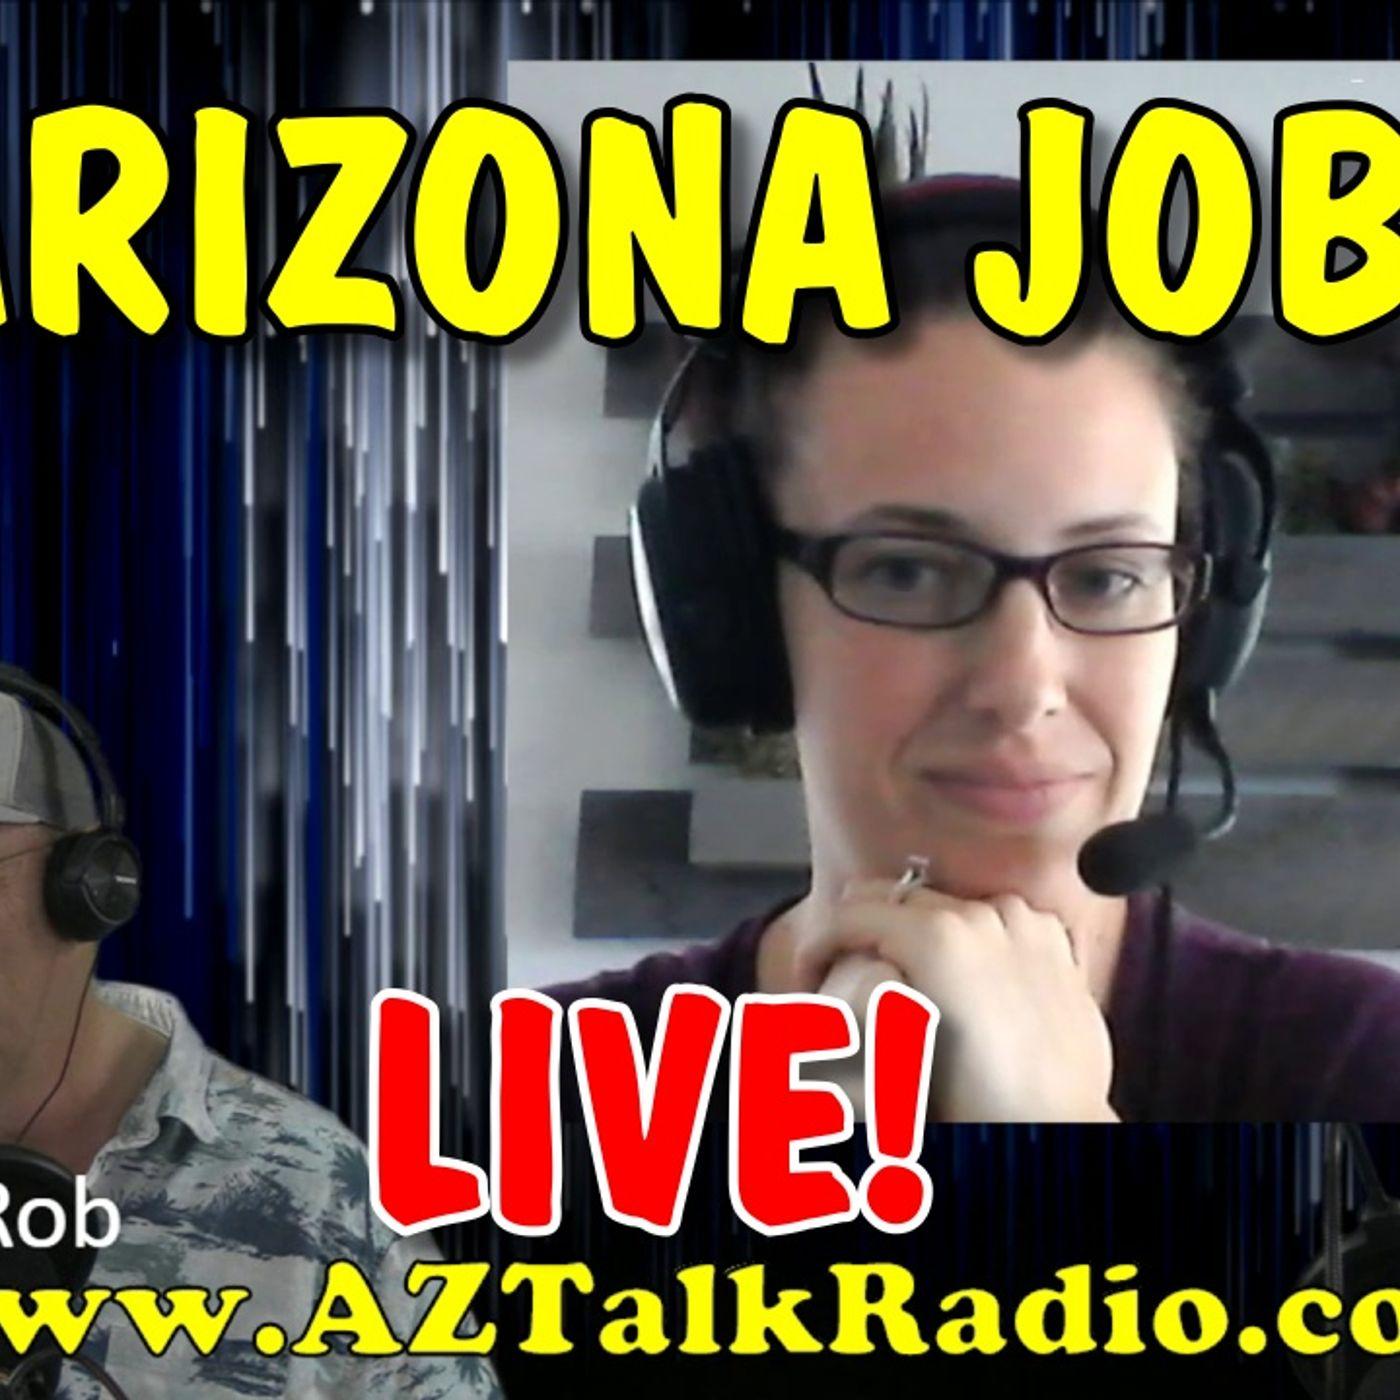 Moving To Arizona, Arizona Living, Arizona Job Searching & Interviews, with Rob & Tracy, Arizona Talk Radio 61